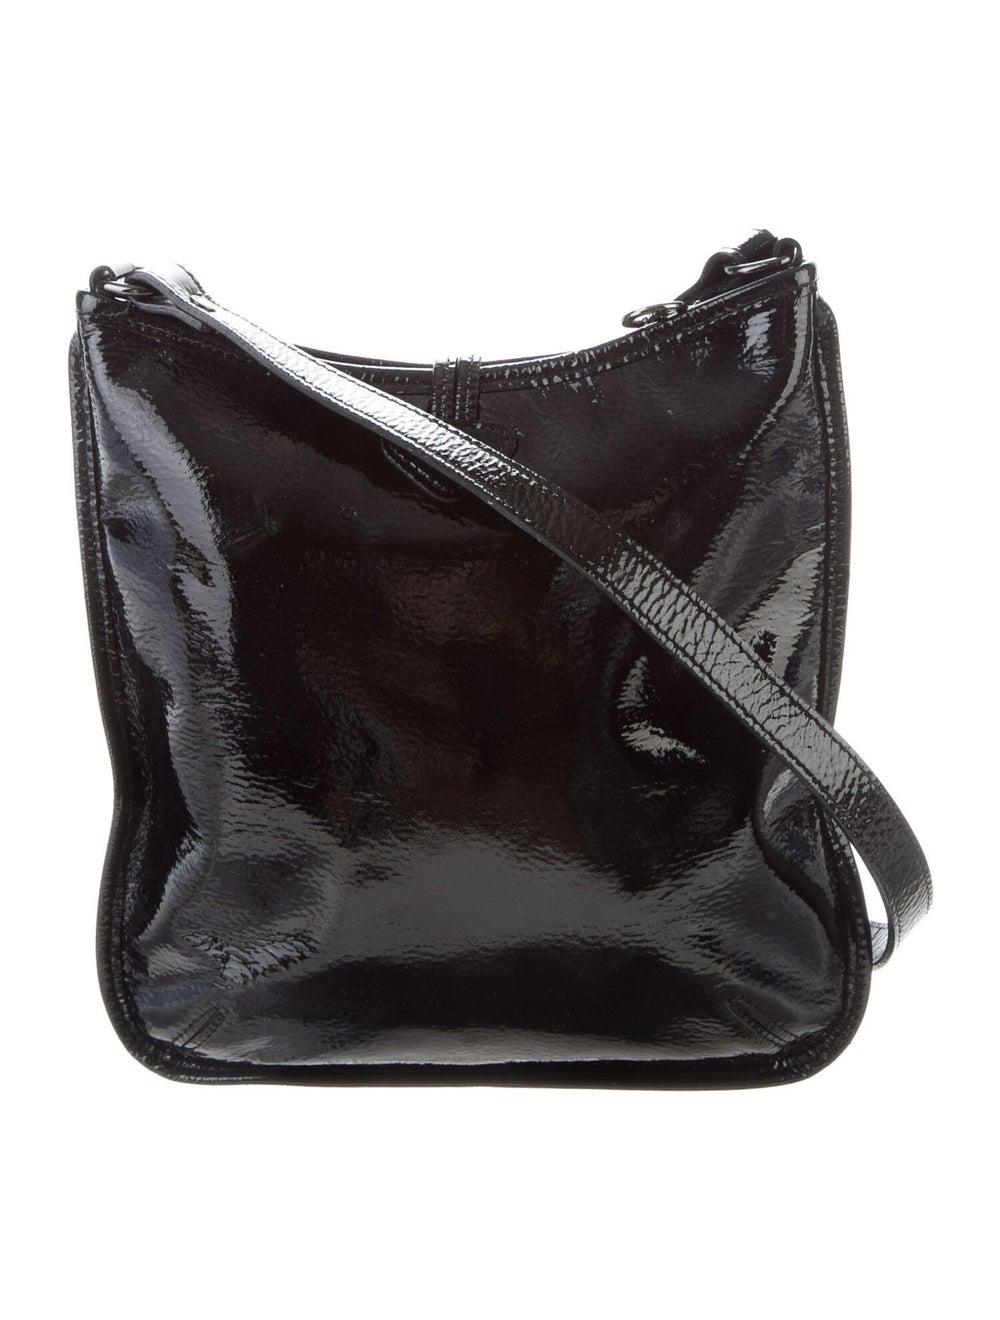 Longchamp Patent Leather Crossbody Bag Black - image 4